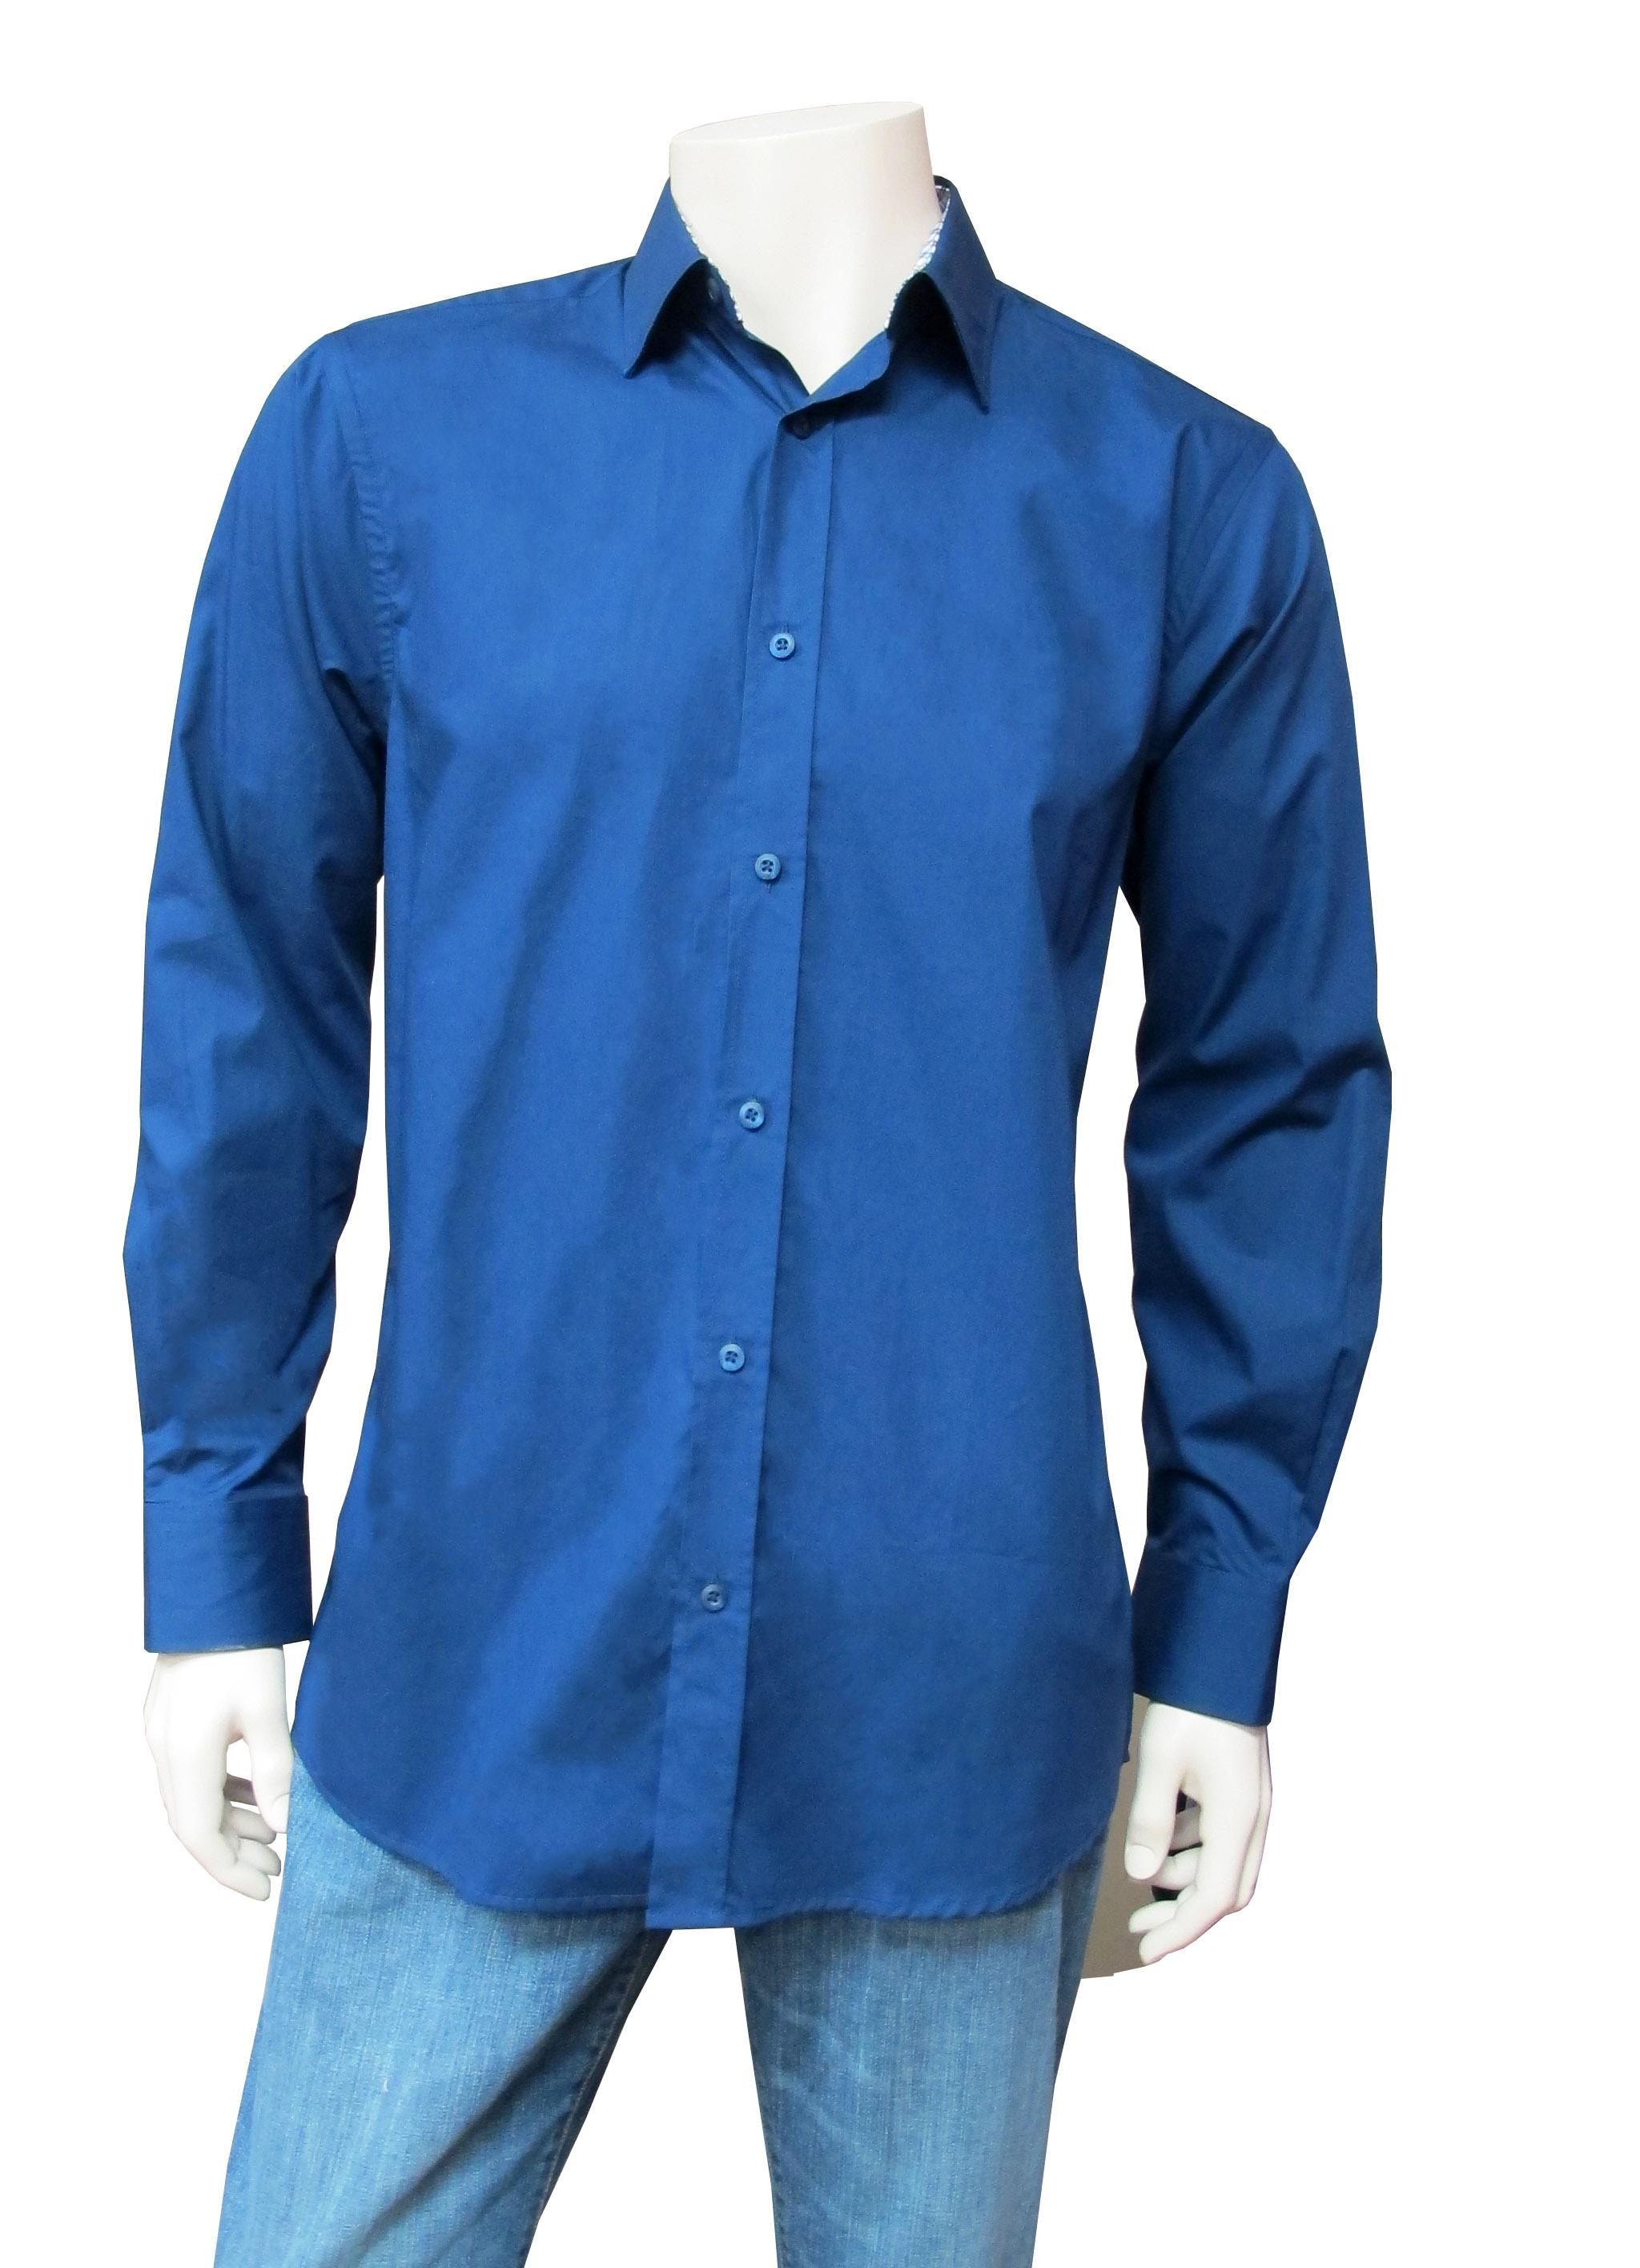 Men's Dress Shirt with Contrast